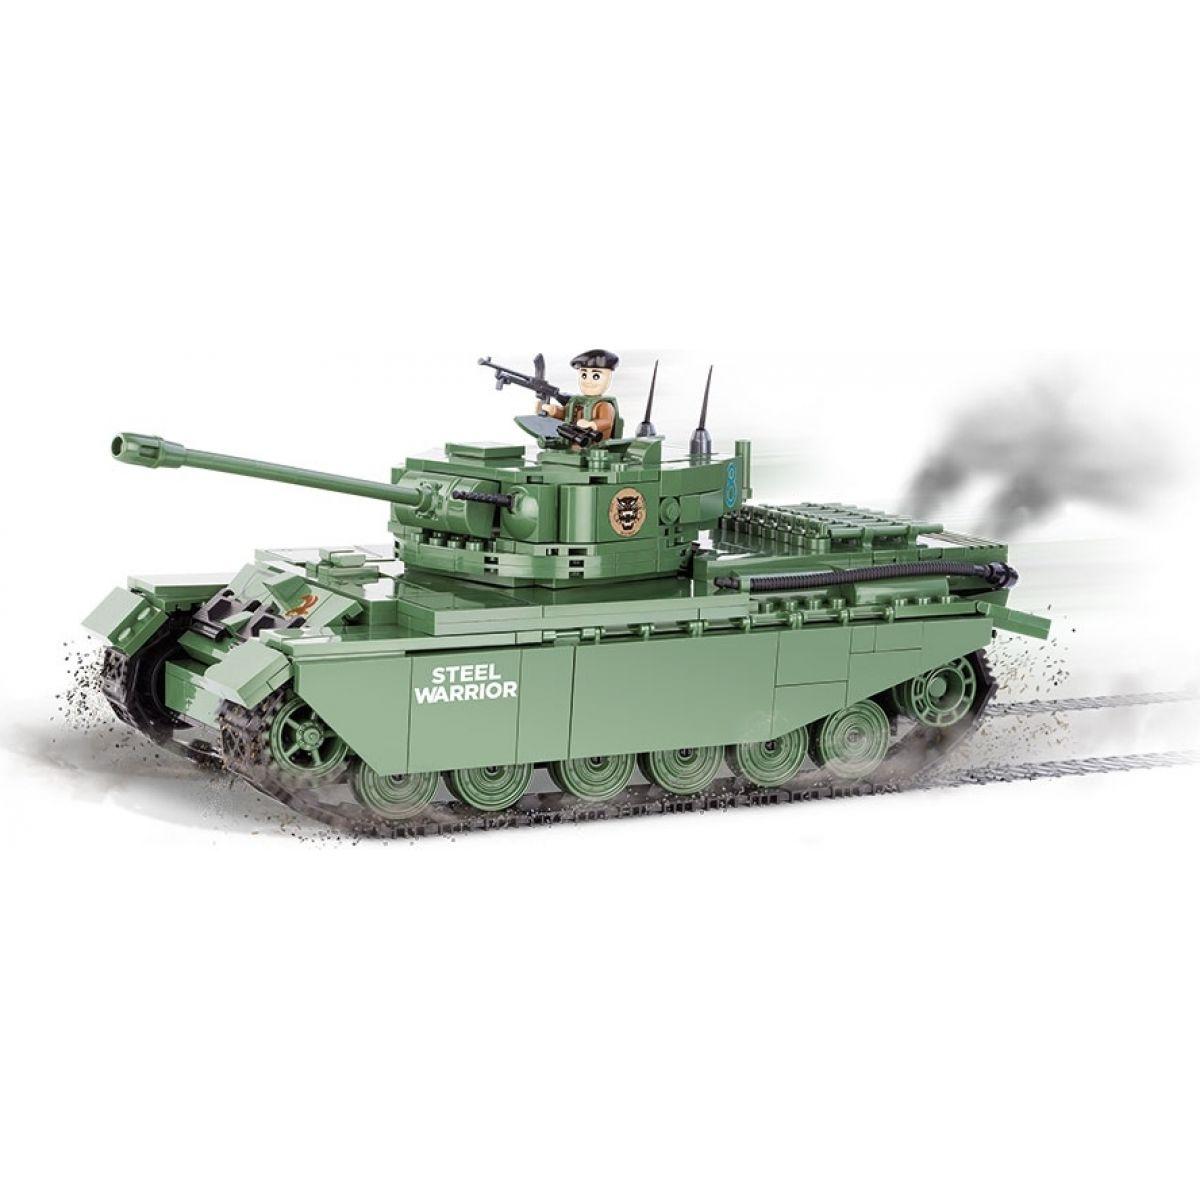 Cobi 3010 World of Tanks Centurion I 610 k 1 f